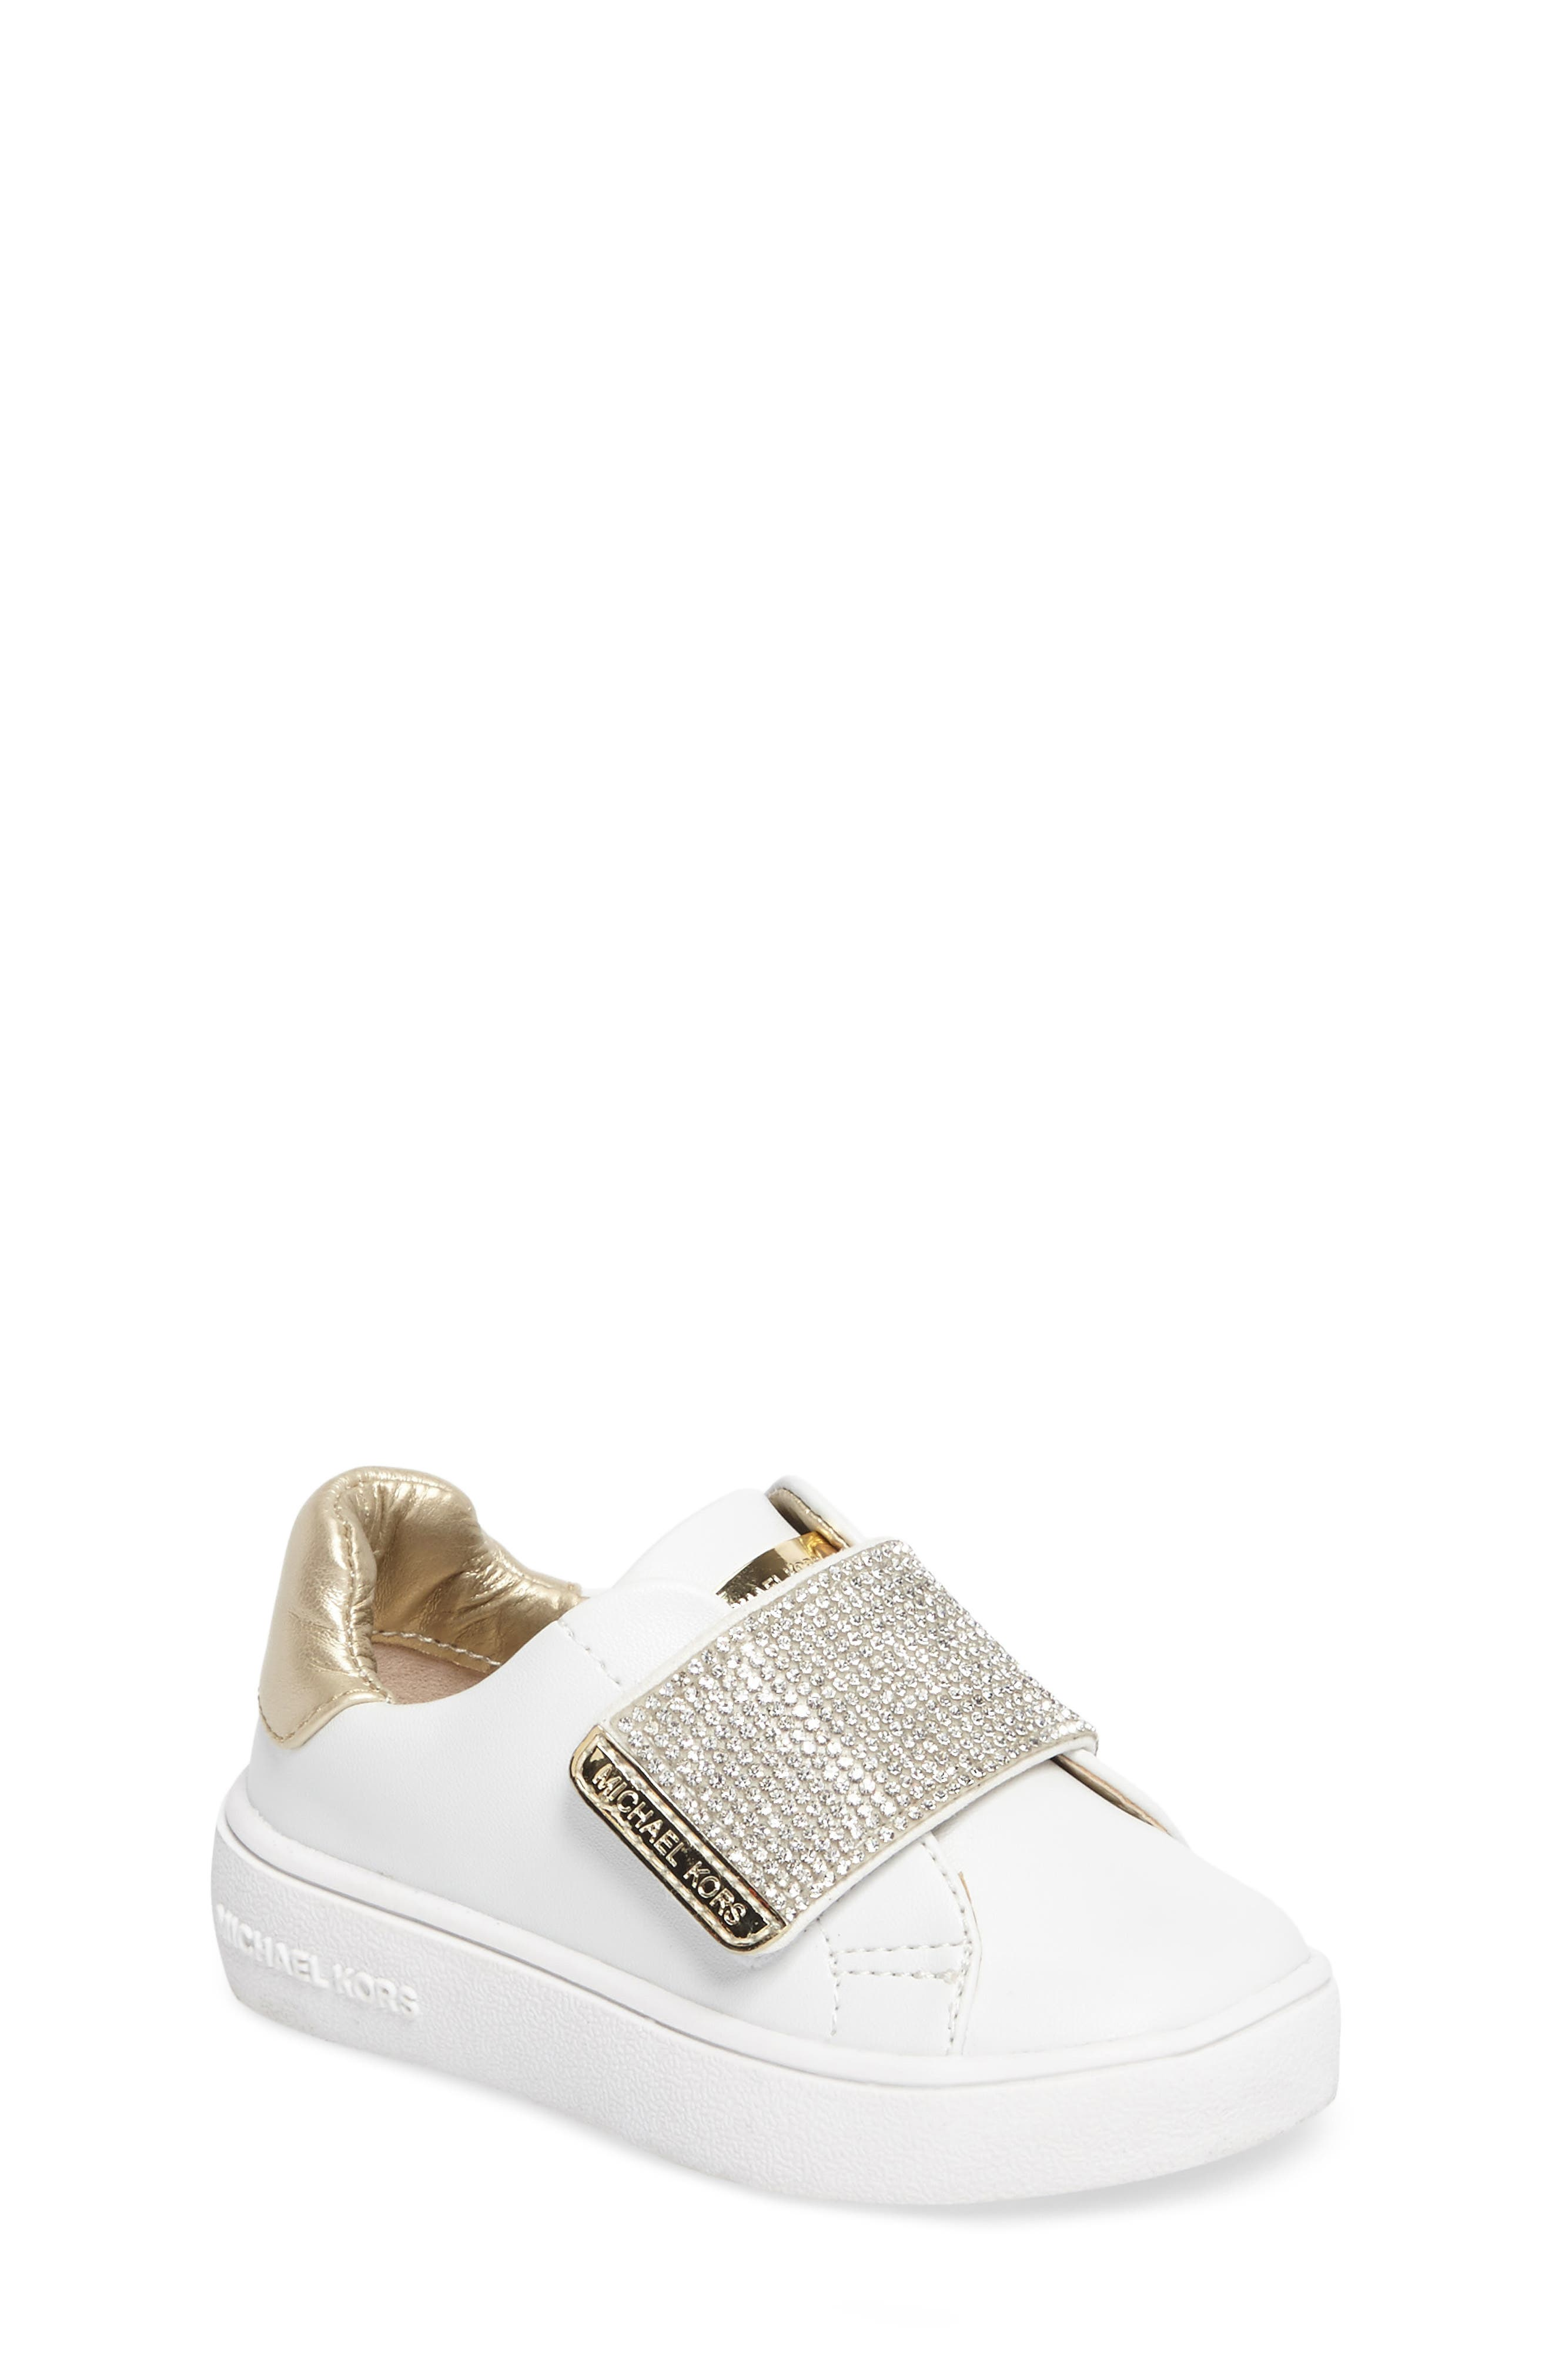 Alternate Image 1 Selected - MICHAEL Michael Kors Ivy Candy Sneaker (Walker, Toddler, Little Kid & Big Kid)